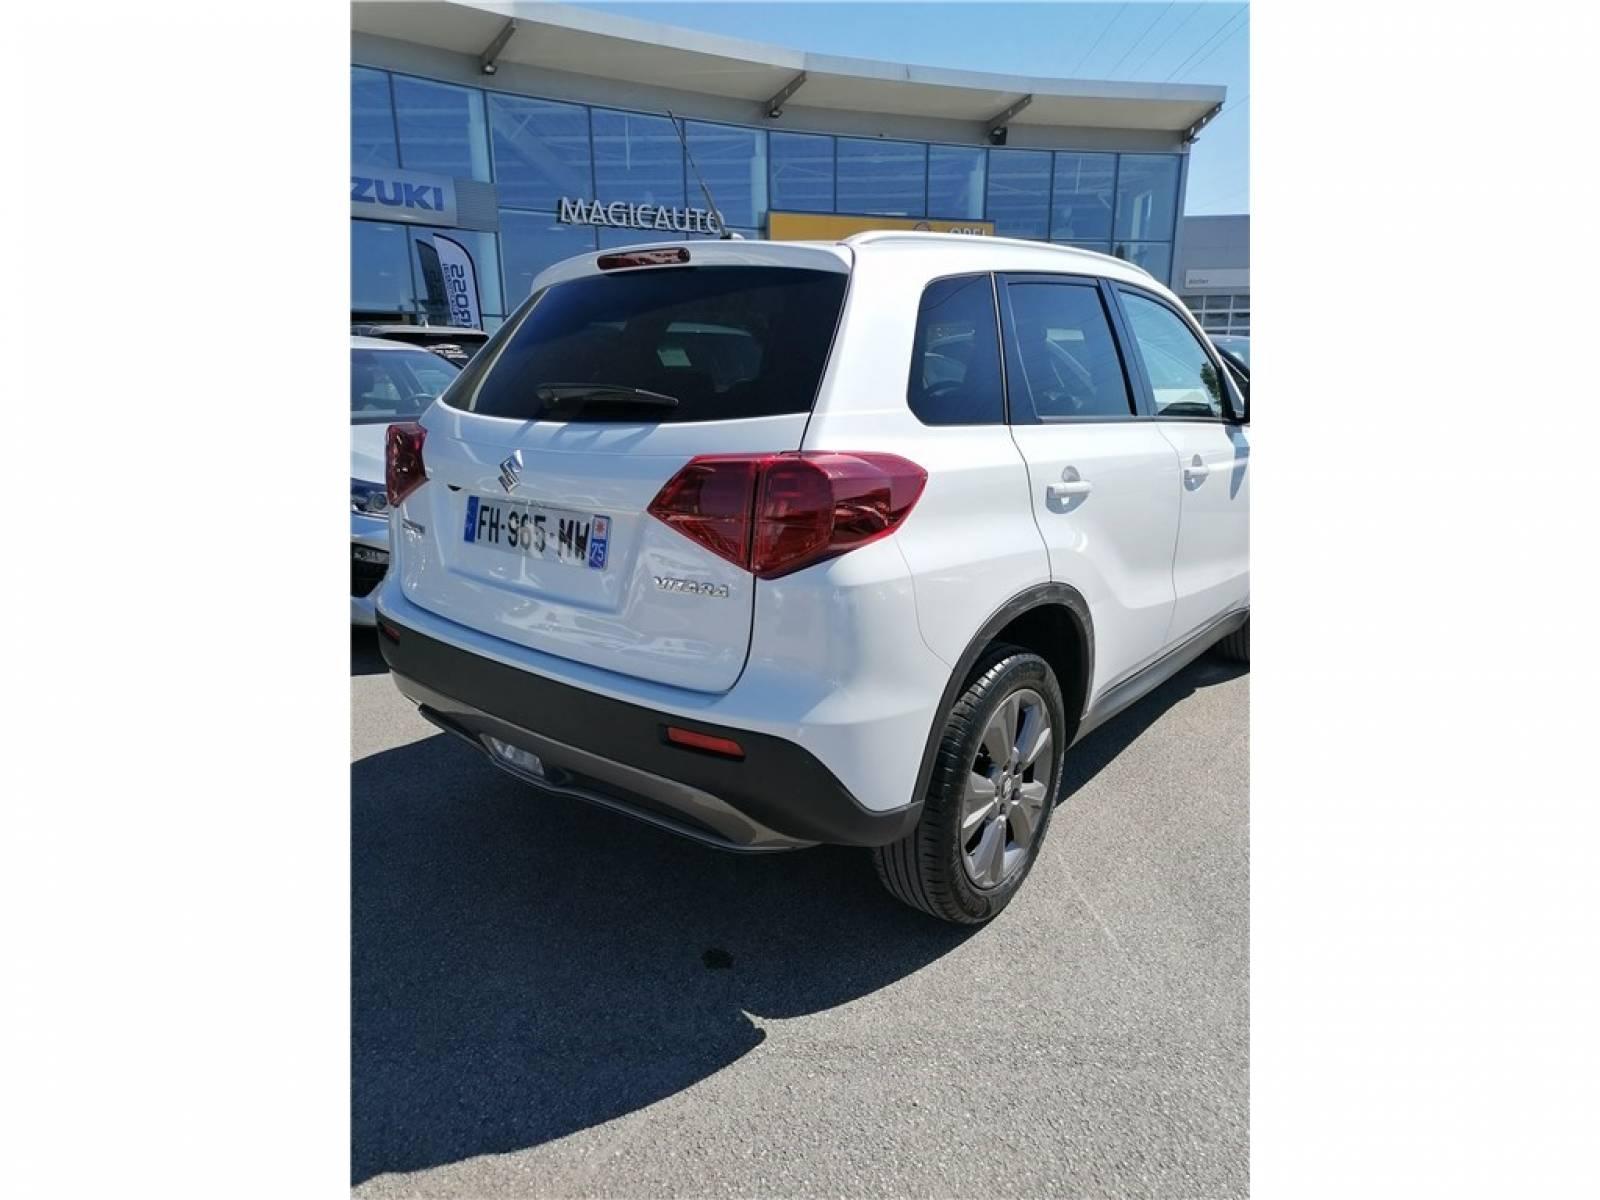 SUZUKI Vitara 1.0 Boosterjet - véhicule d'occasion - Groupe Guillet - Opel Magicauto - Chalon-sur-Saône - 71380 - Saint-Marcel - 41